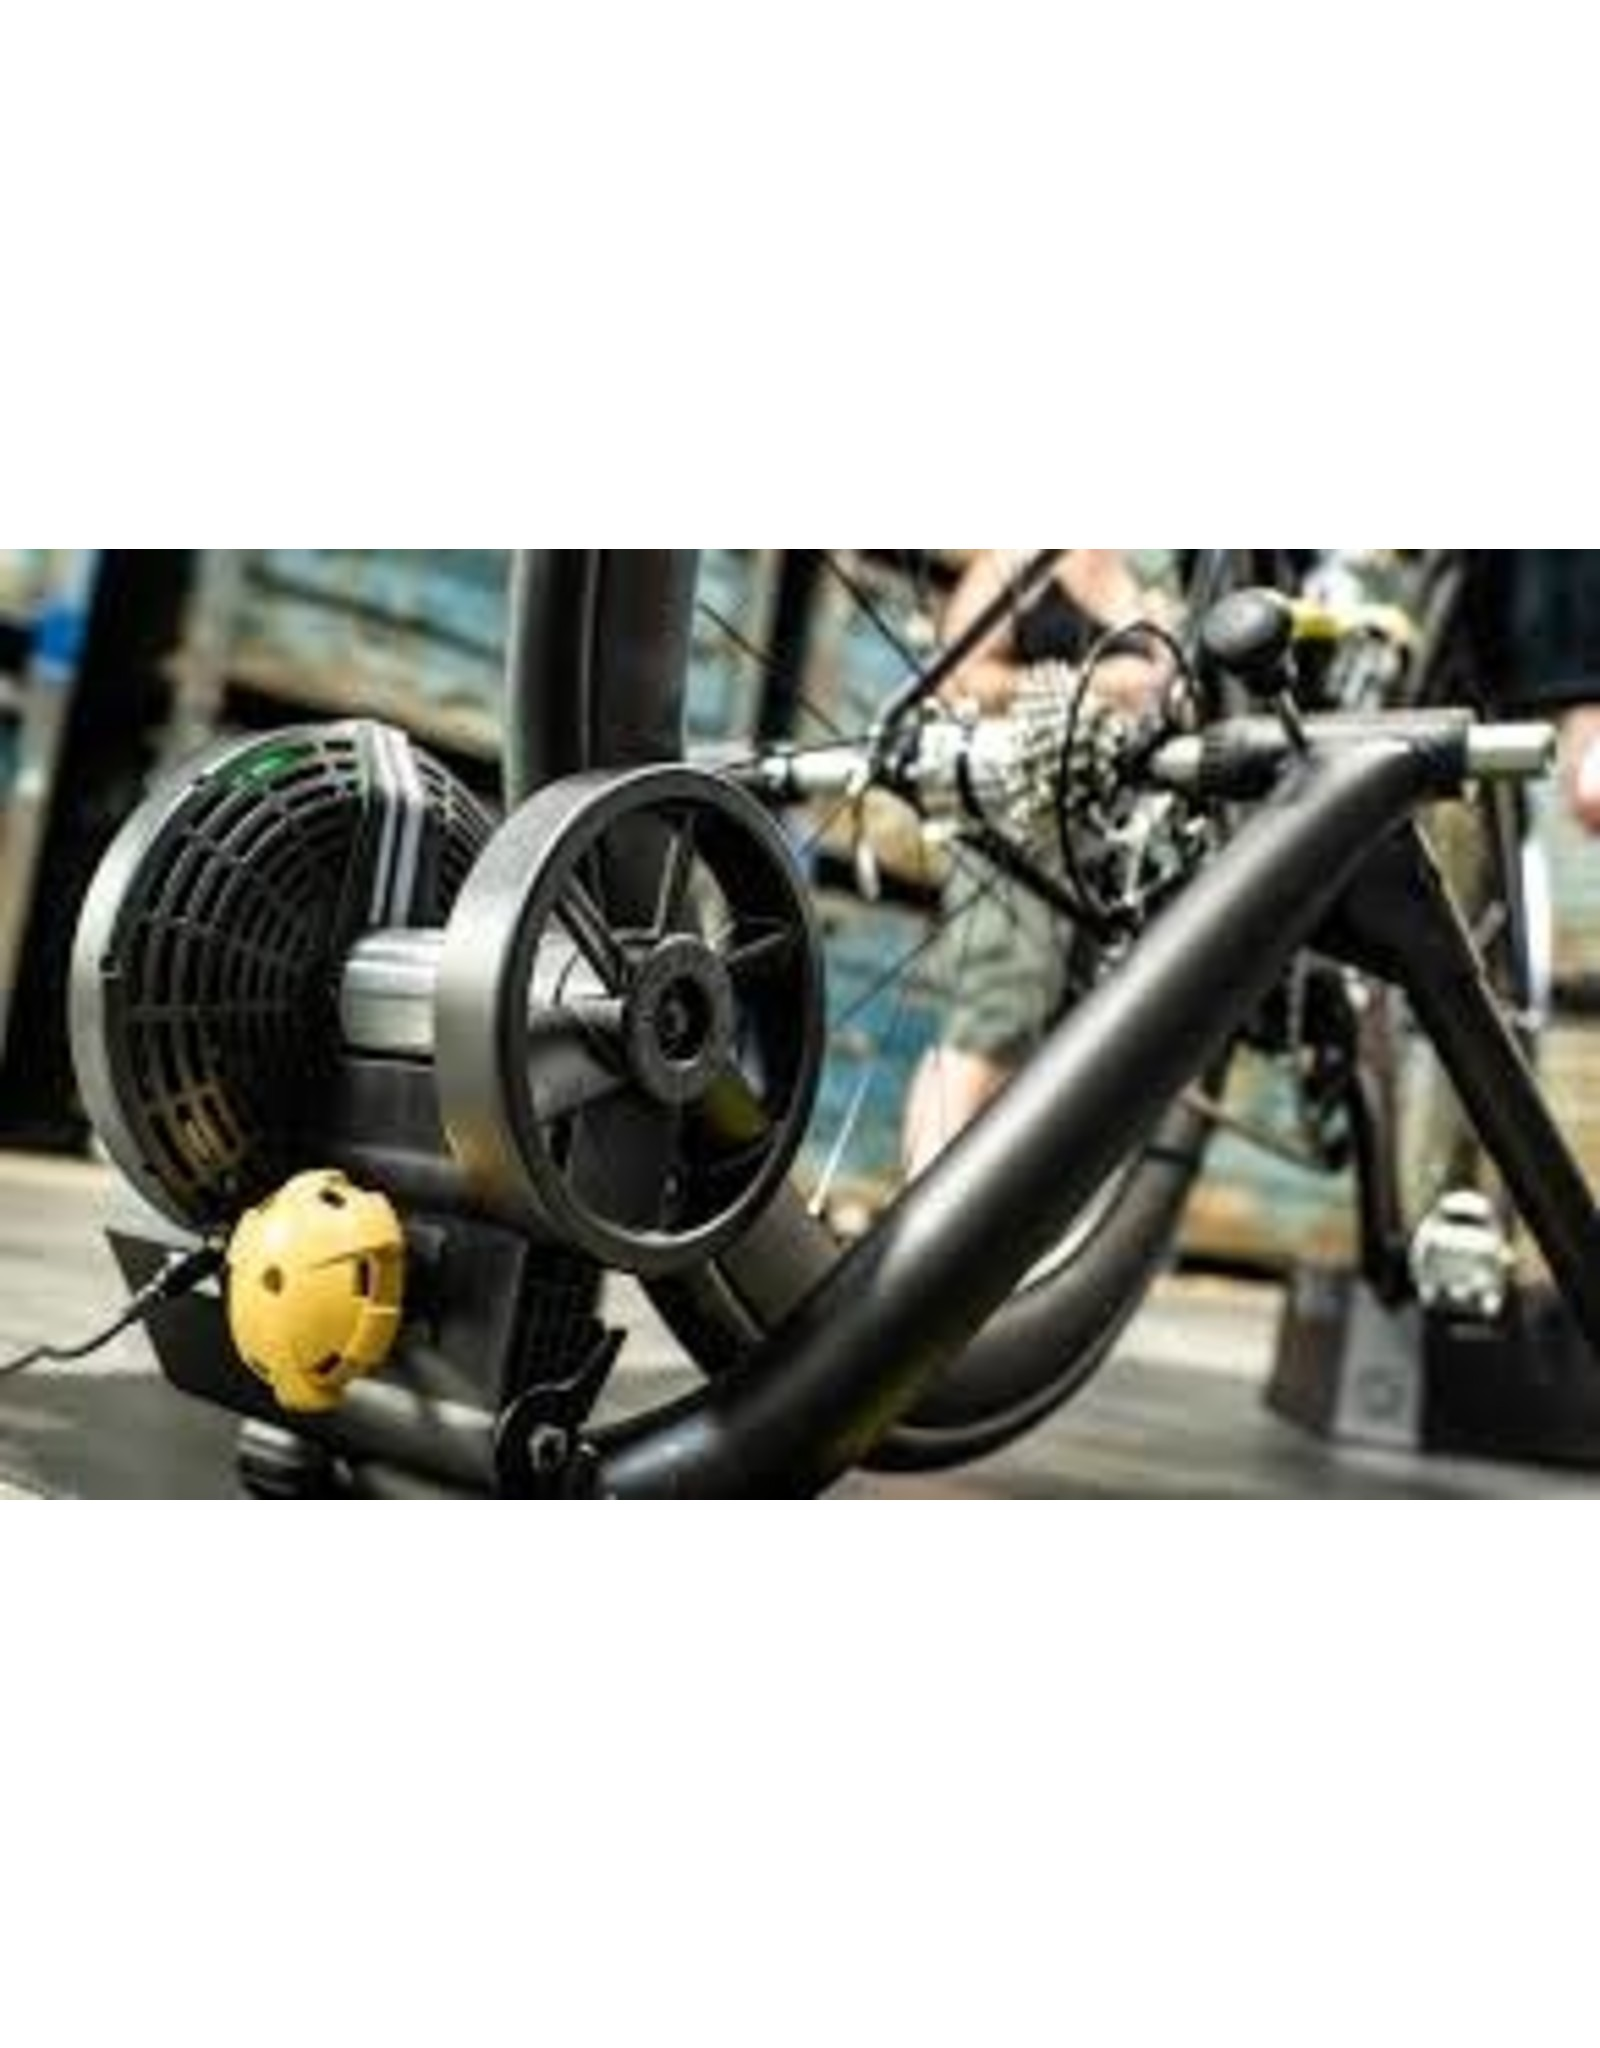 Saris M2 Smart Trainer - Electronic Resistance, Adjustable